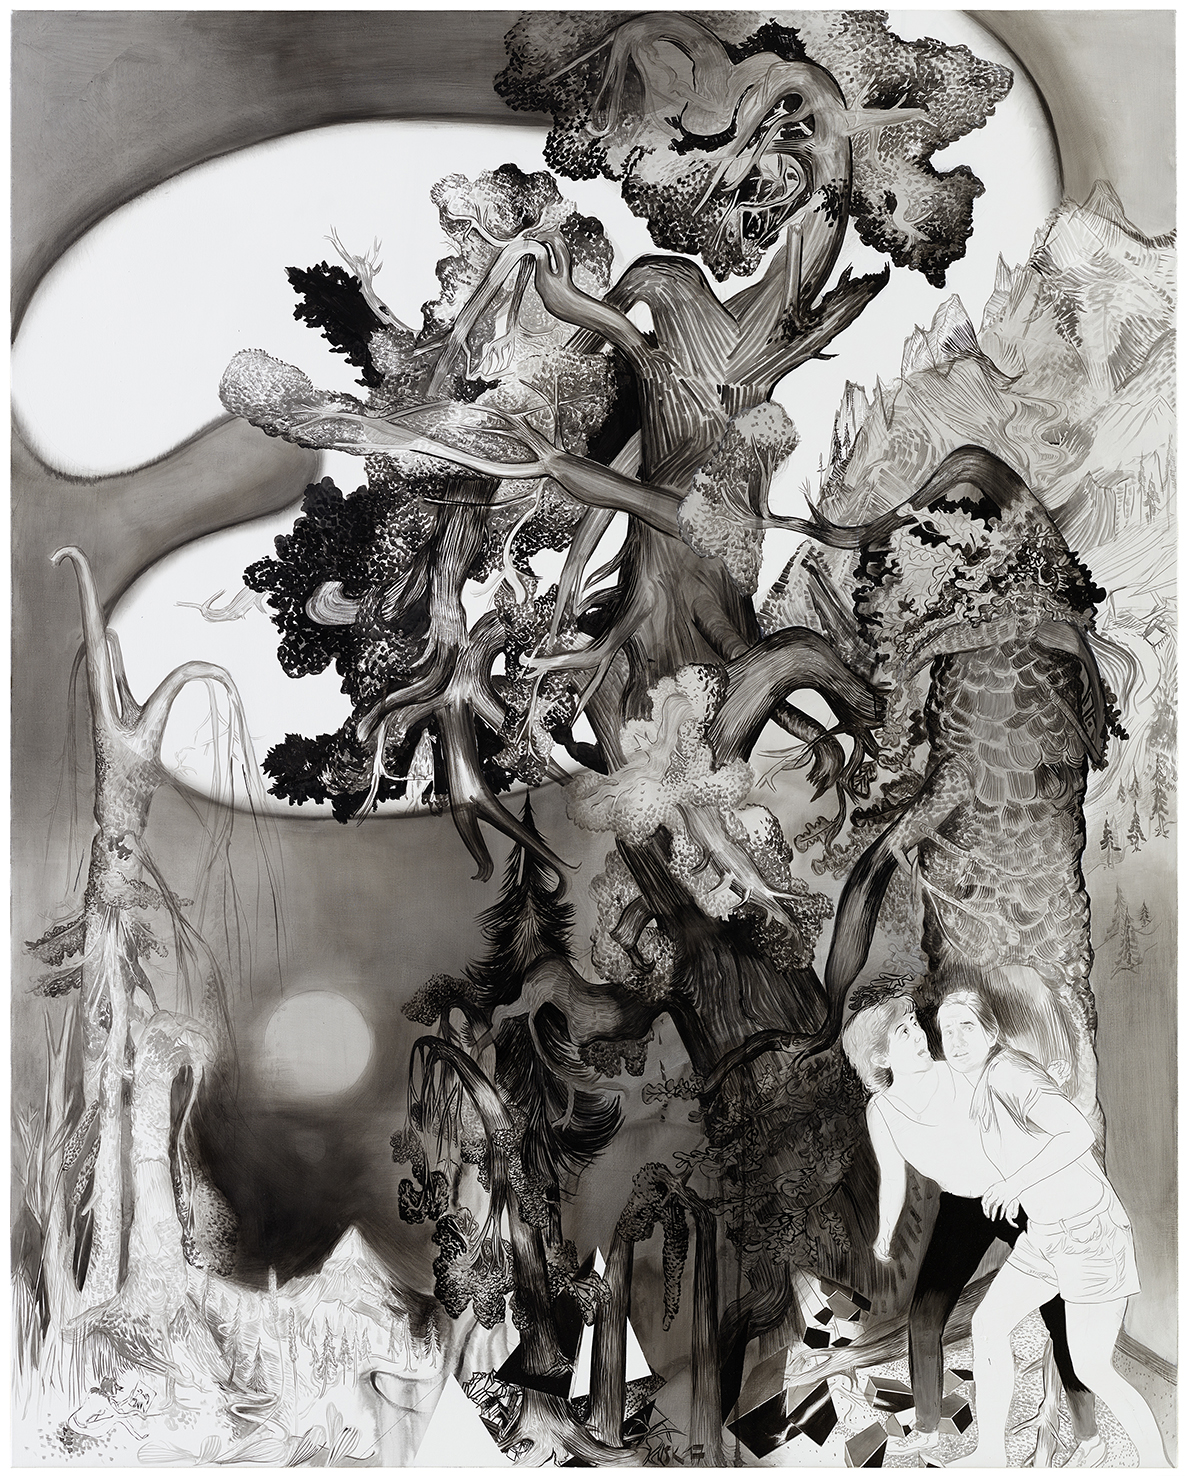 Susanne Kühn, 2018, Girls hiking, 250 x 190 cm, mixed media on canvas